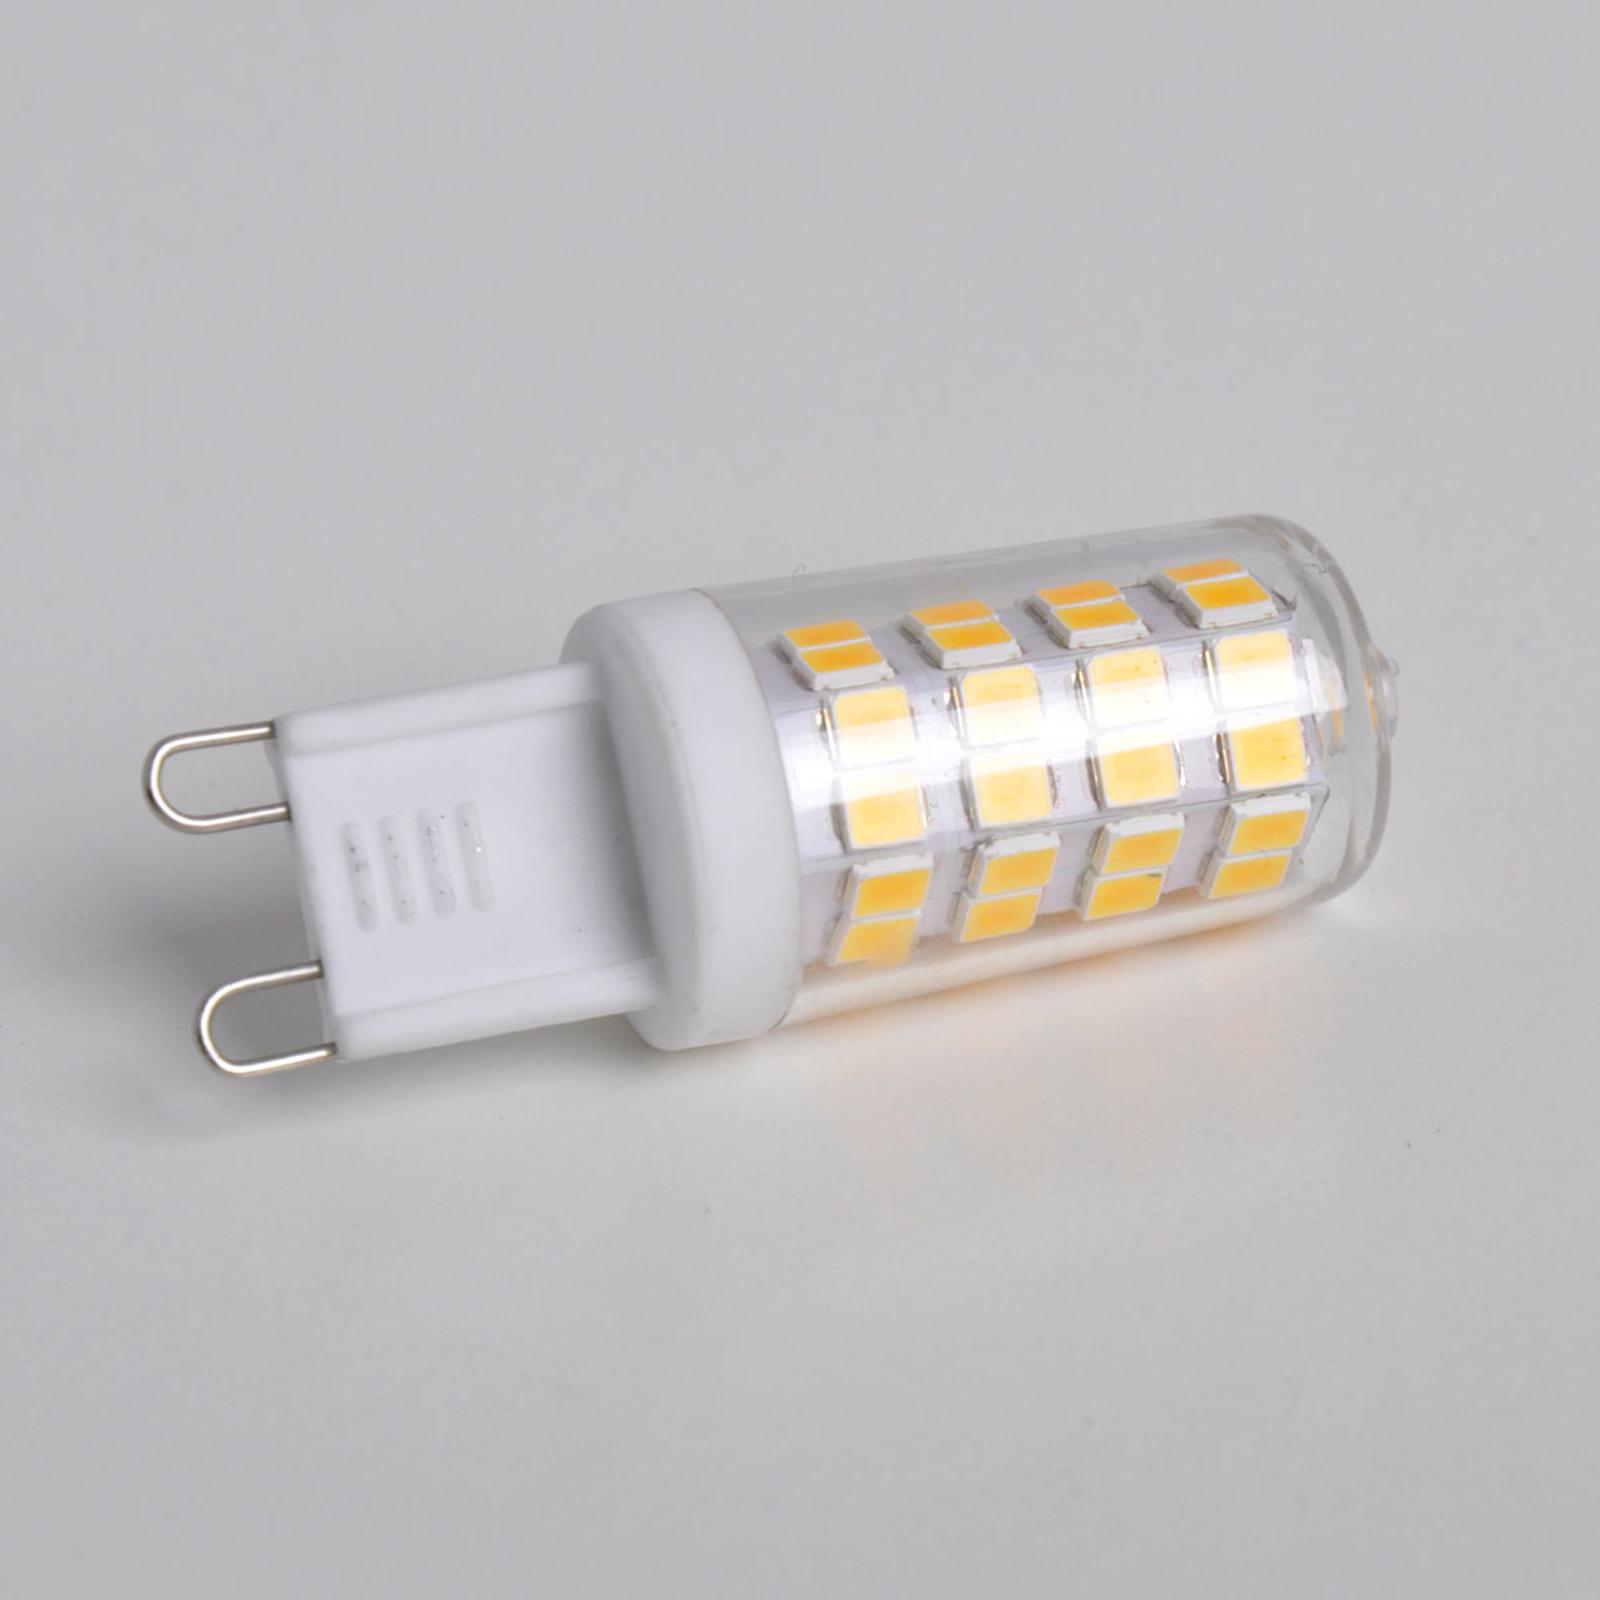 LED stiftlamp G9 3W, warmwit, 330 lumen